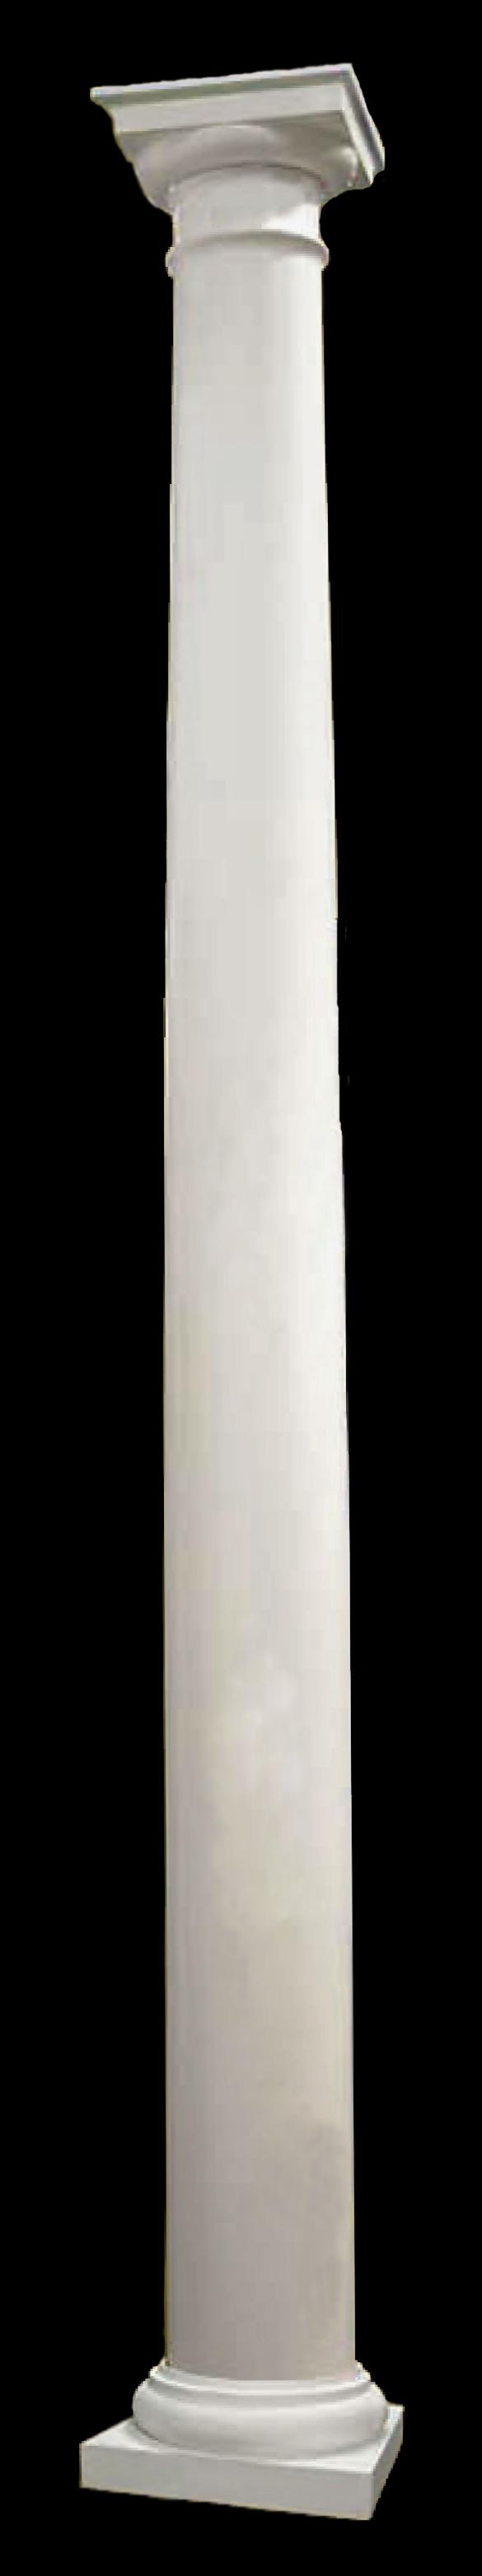 Tuscan frp fiberglass composite exterior columns for Tuscan columns